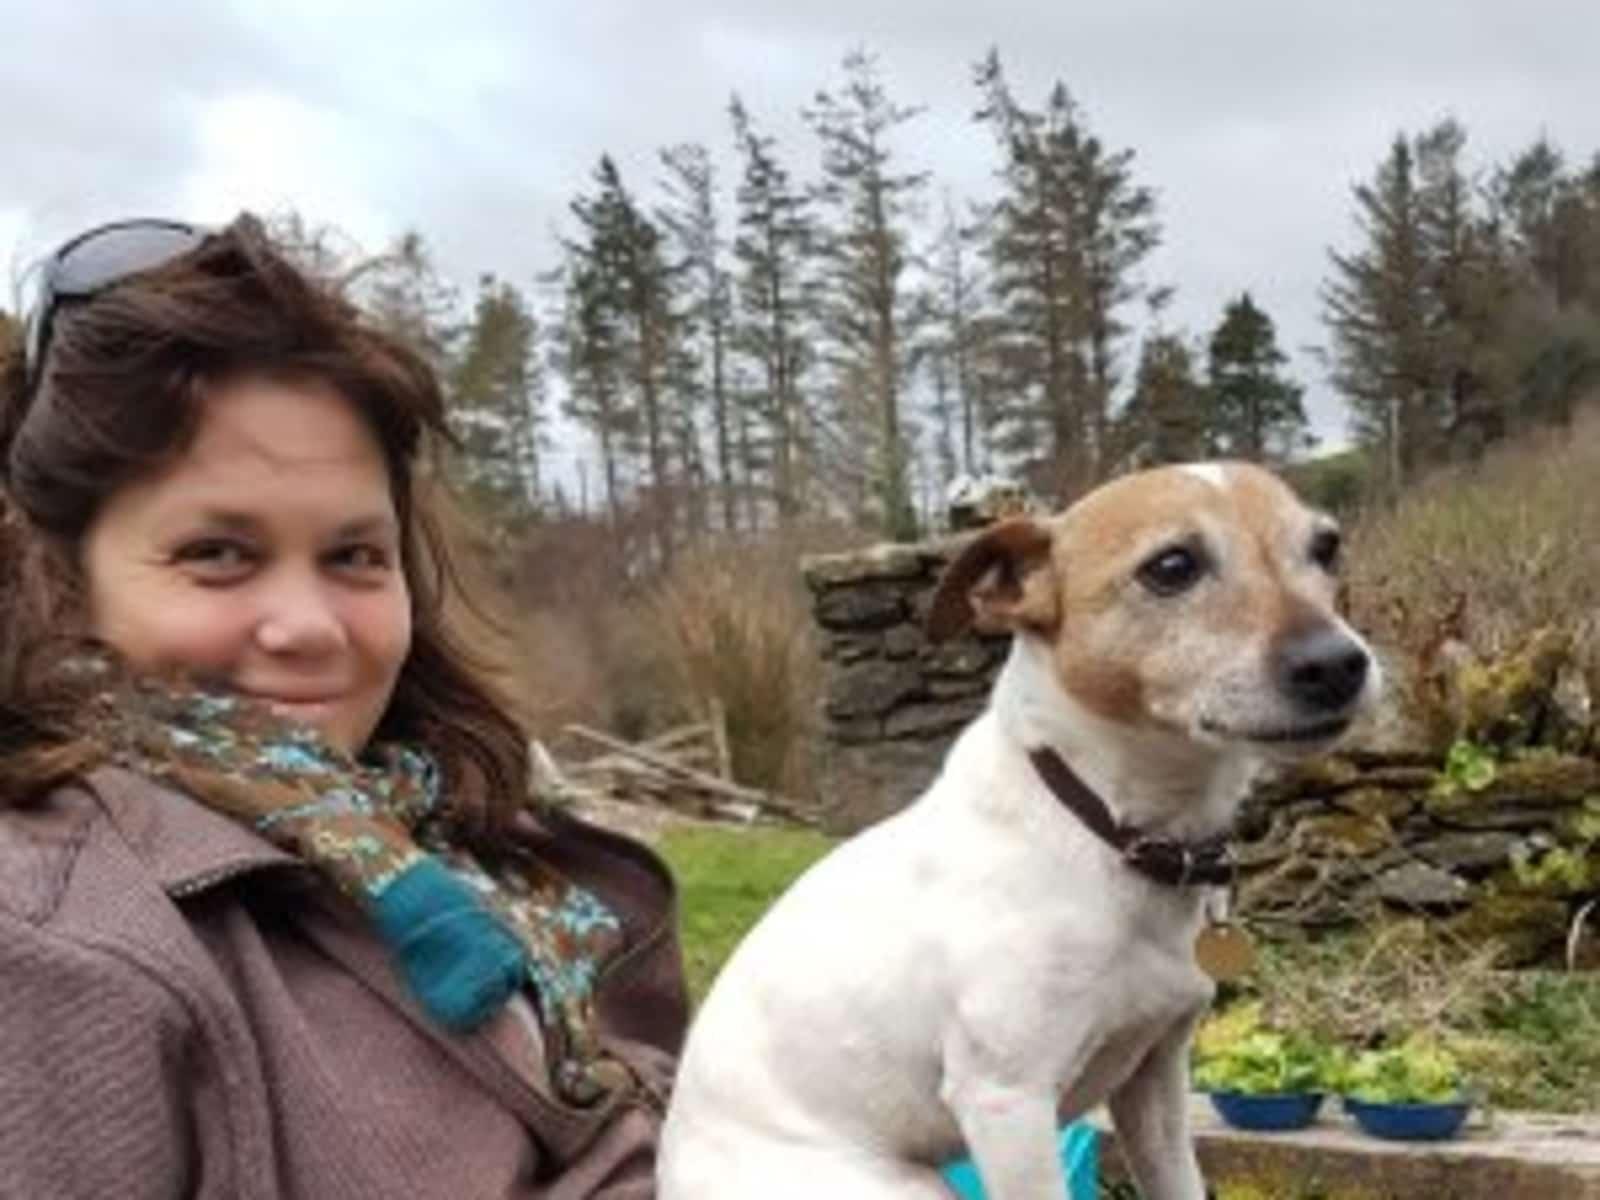 Naomi & Killian from Westport, Ireland